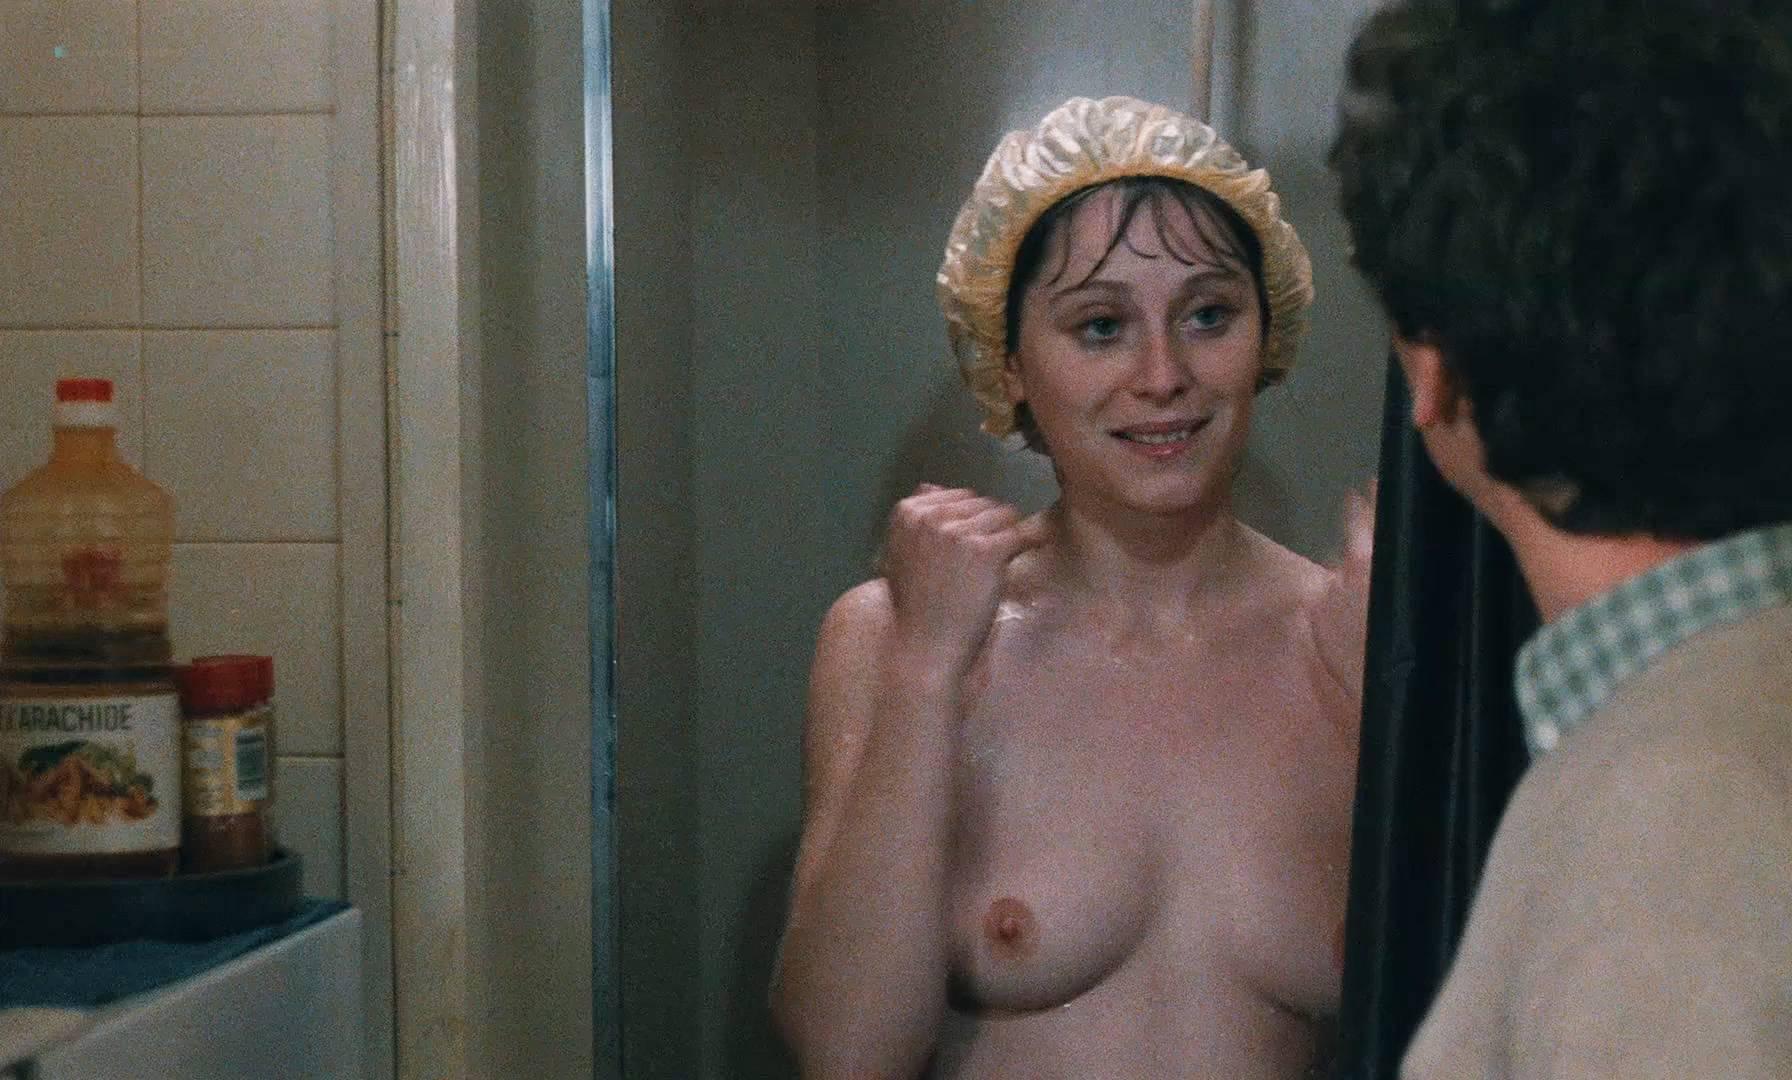 Communication on this topic: Susan sarandon nude, micaela-schafer-etcbb10-ger-nude-shower-2010/